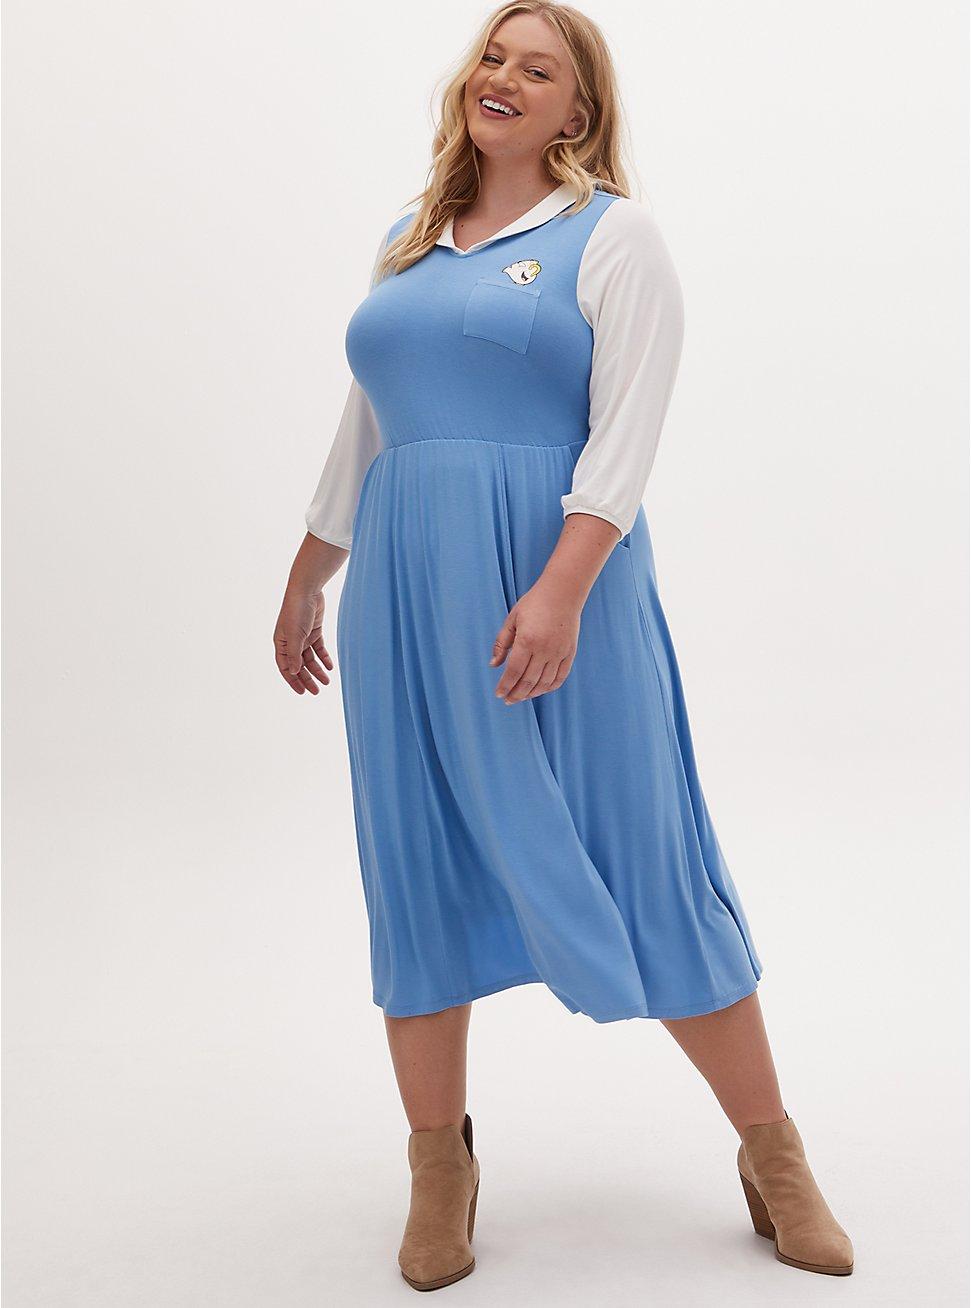 Disney Beauty and the Beast Belle Blue Midi Dress, BLUE  WHITE, hi-res